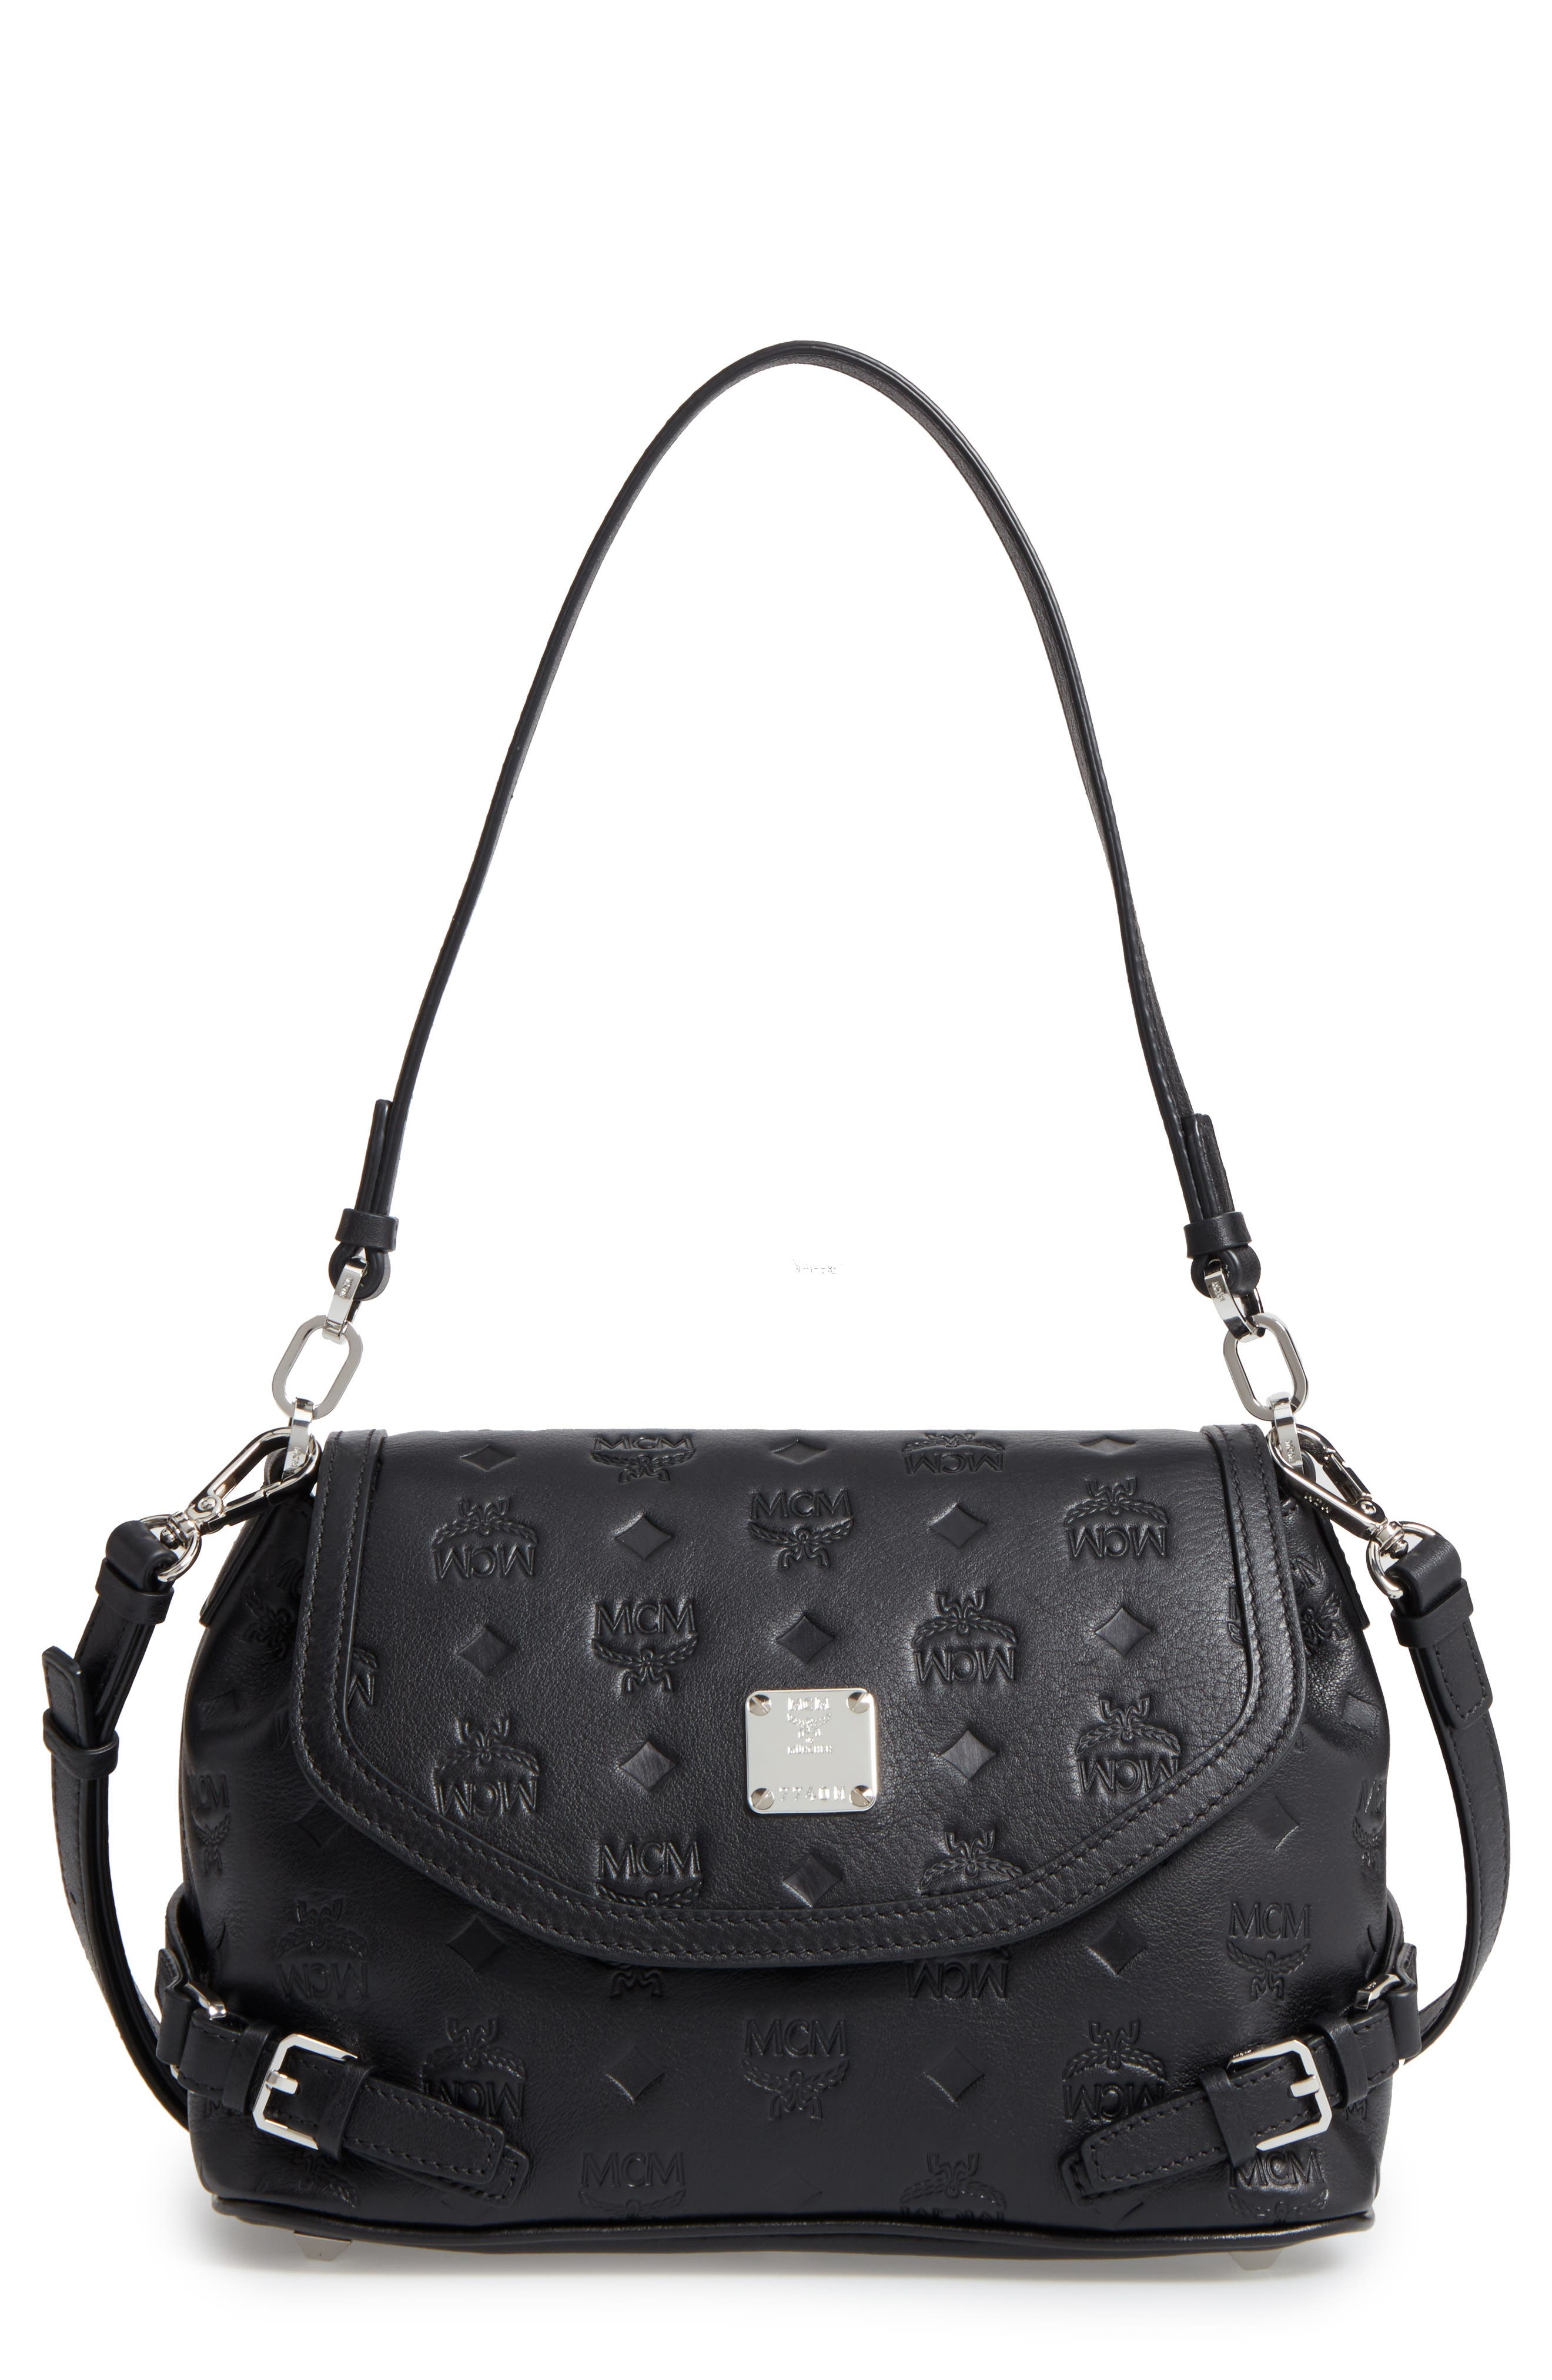 Alternate Image 1 Selected - MCM Signature Monogram Embossed Leather Shoulder/Crossbody Bag